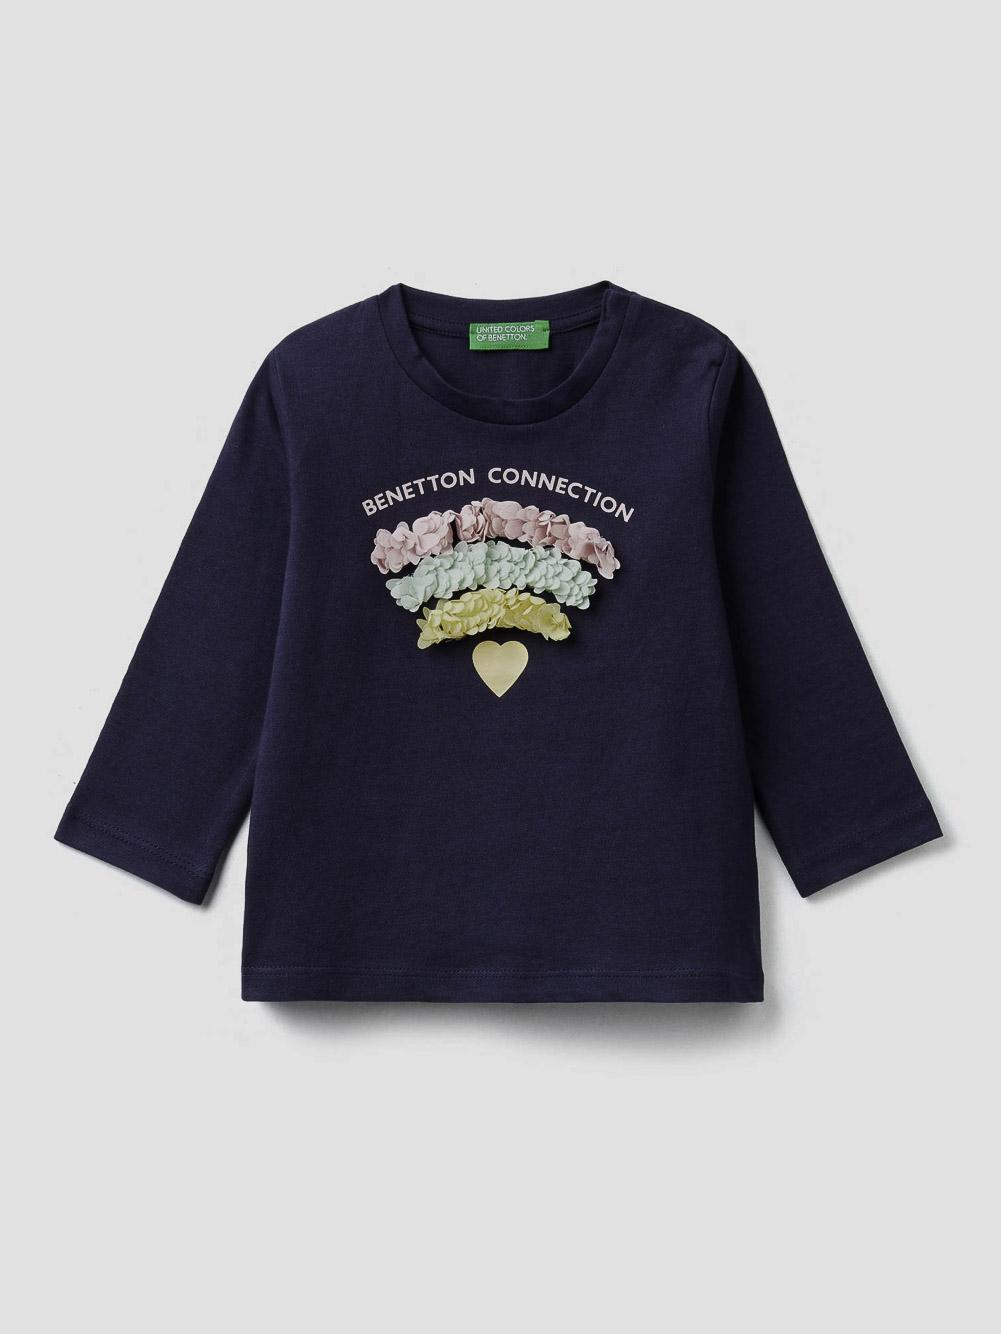 012 BENETTON T-shirt με τύπωμα 3I1XC14U6 20A252